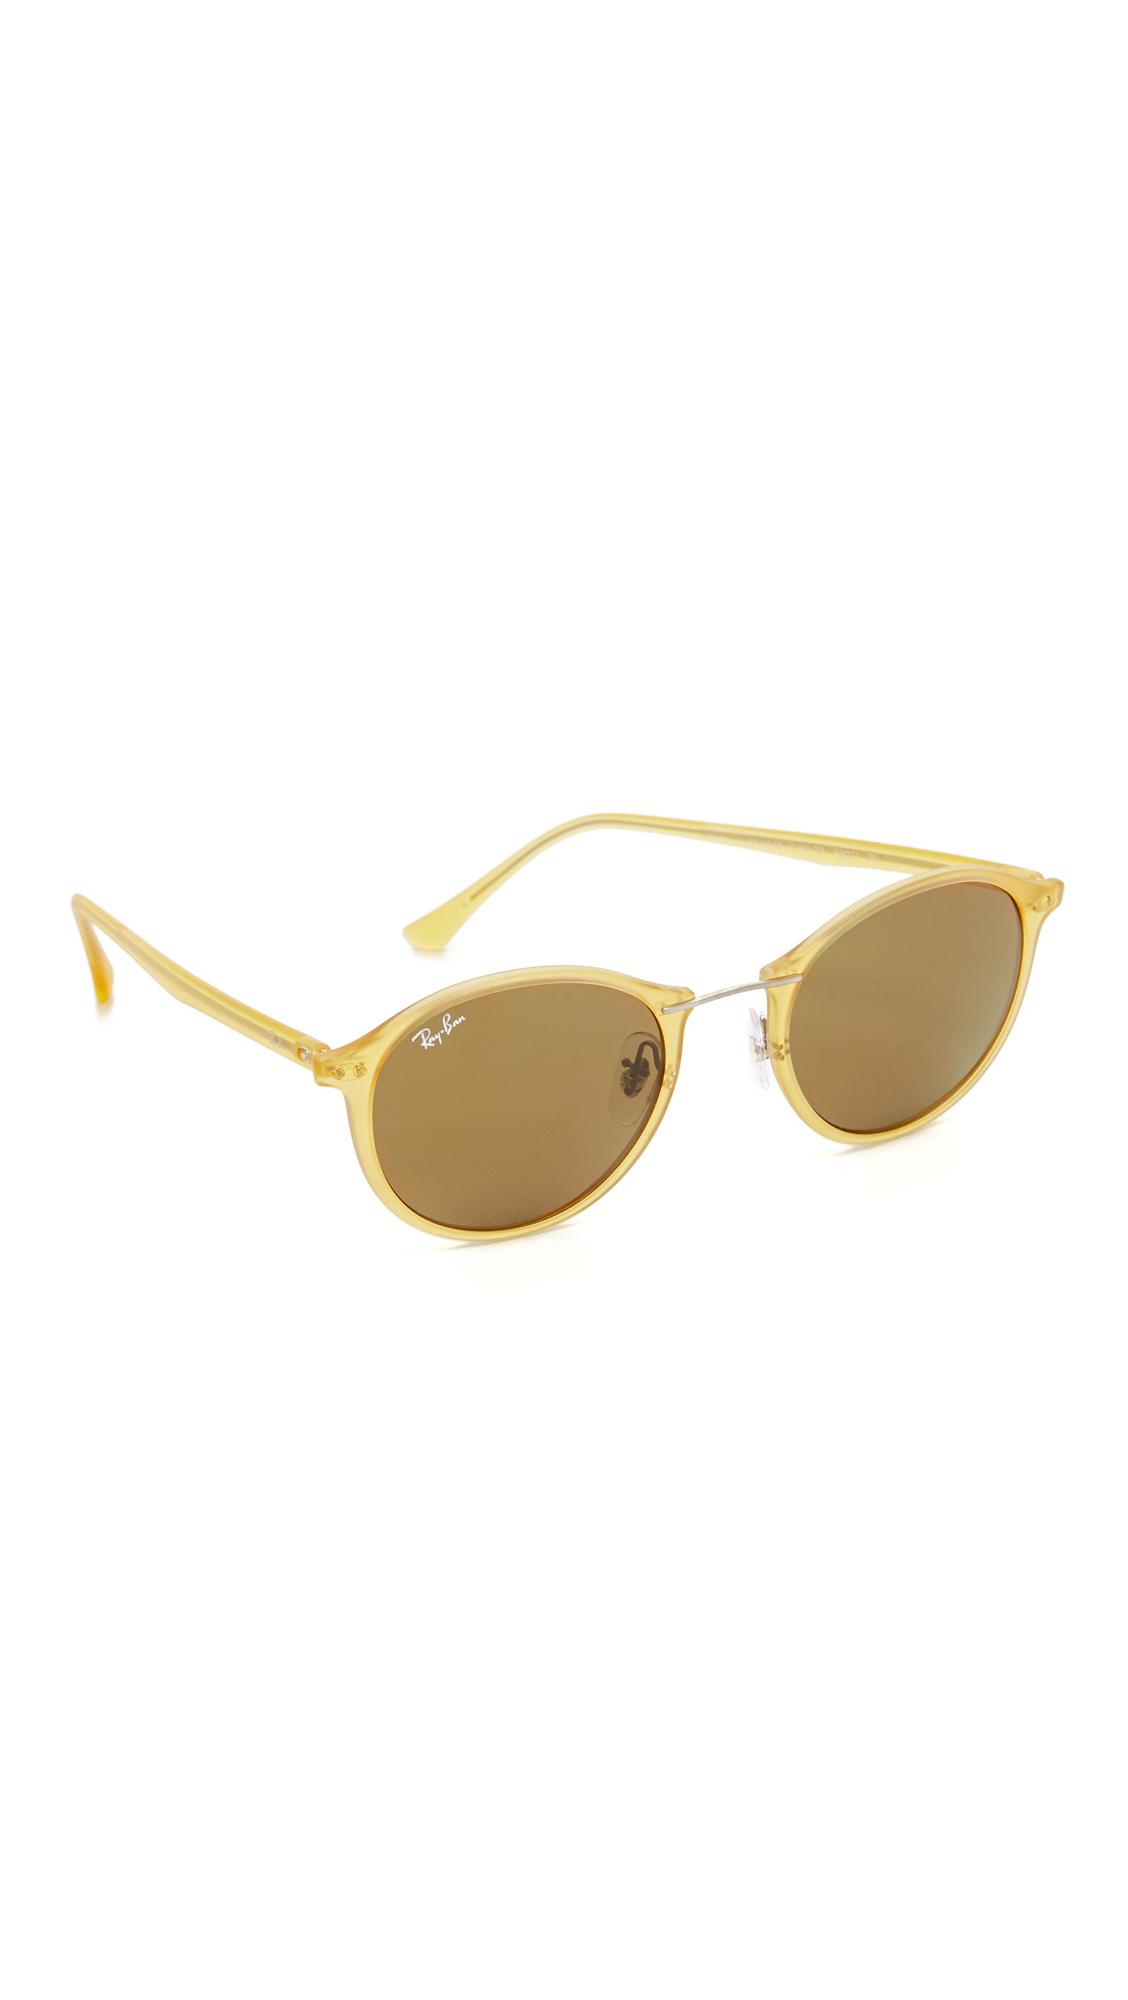 3d6ab923791 top quality ray ban womens tech light aviator sunglasses brands ...